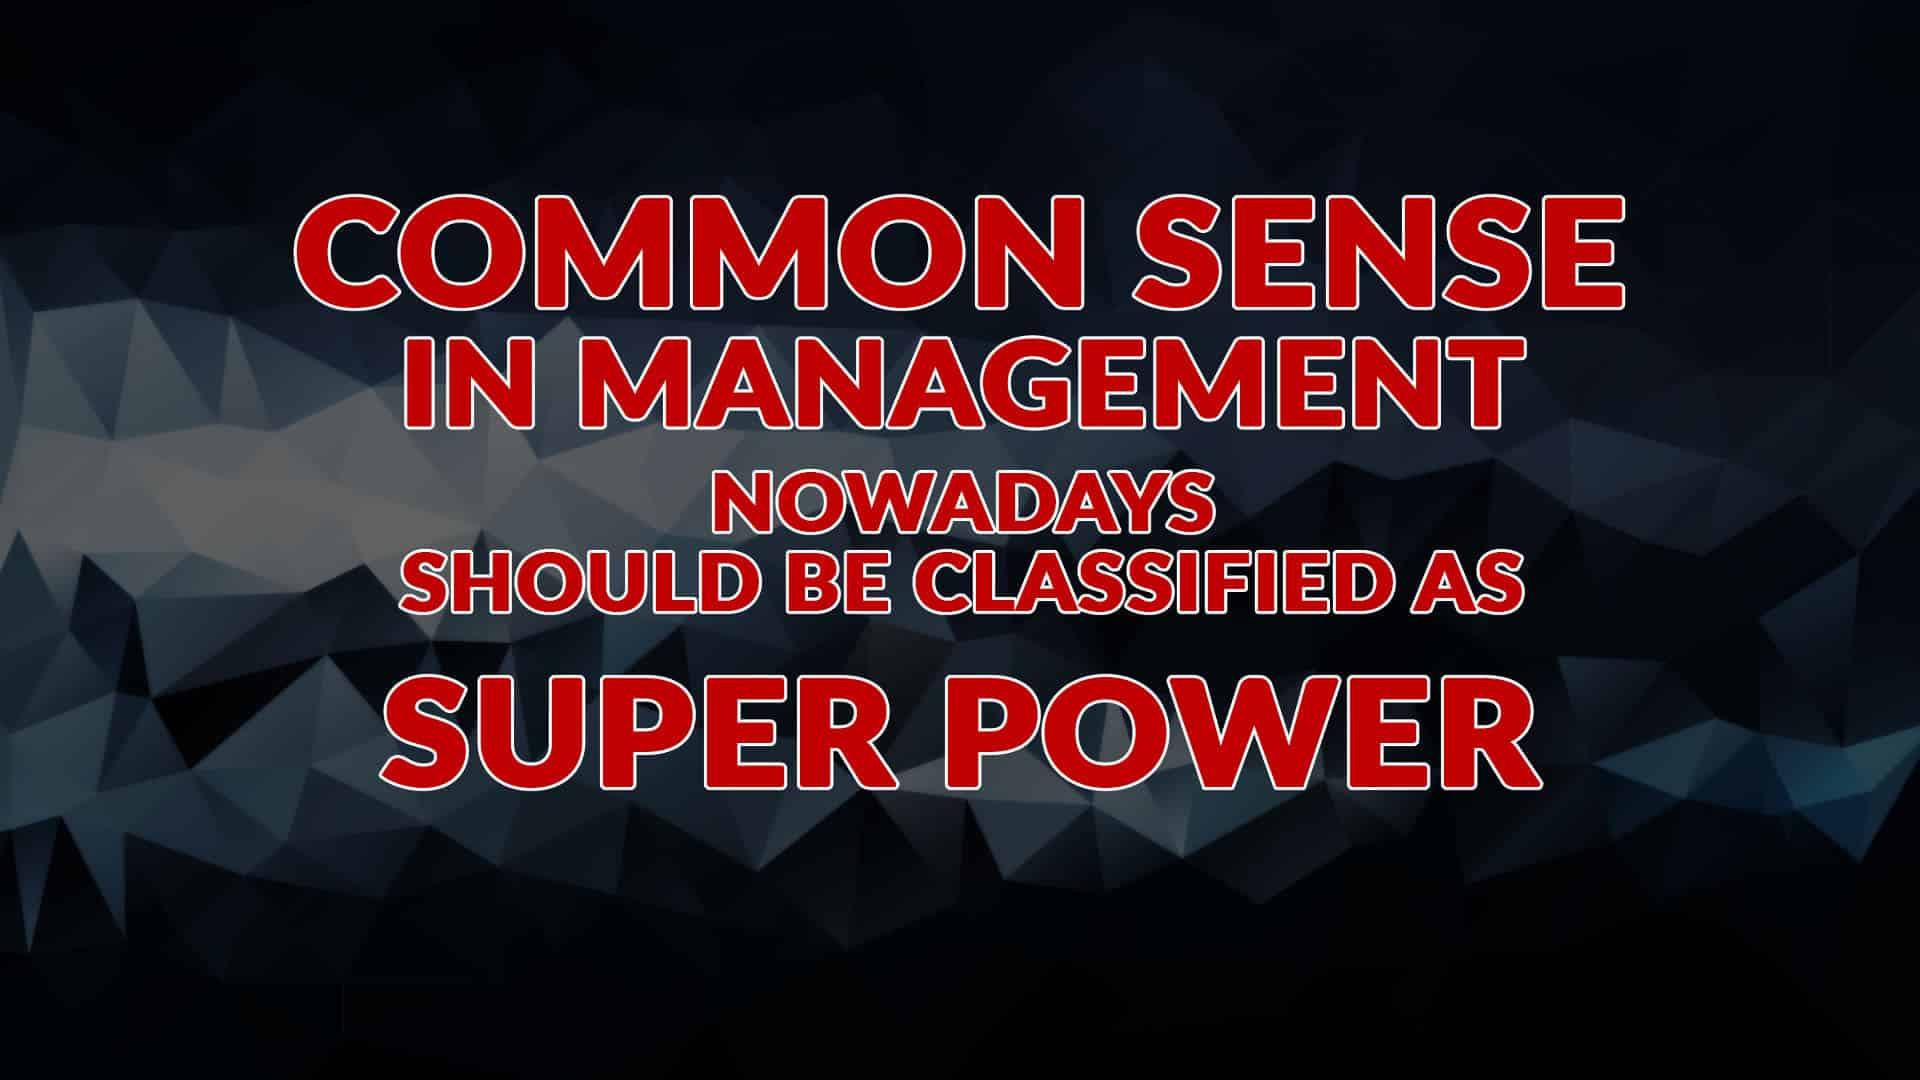 Common Sense in Management